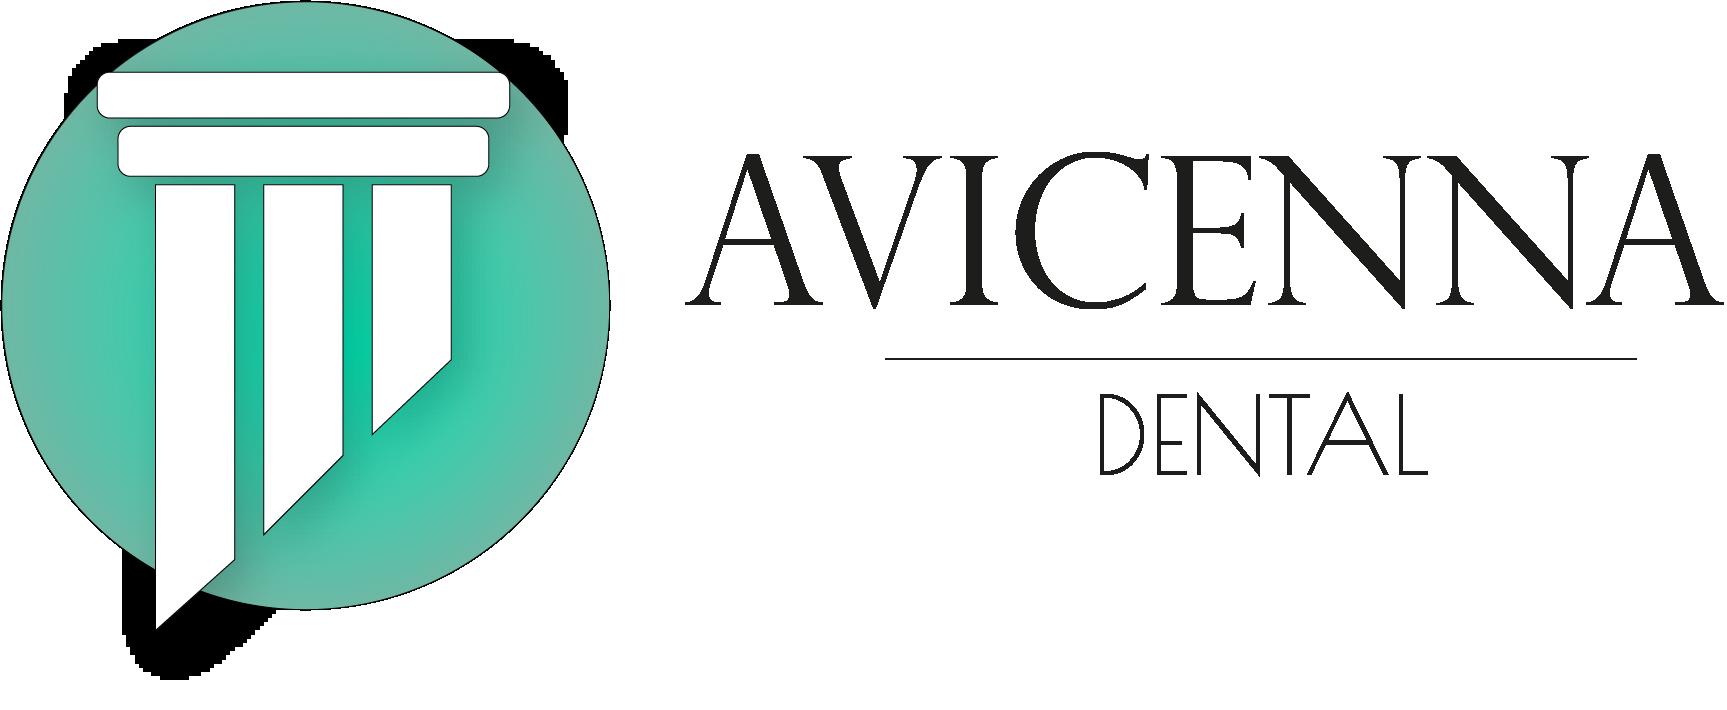 Avicenna Dent